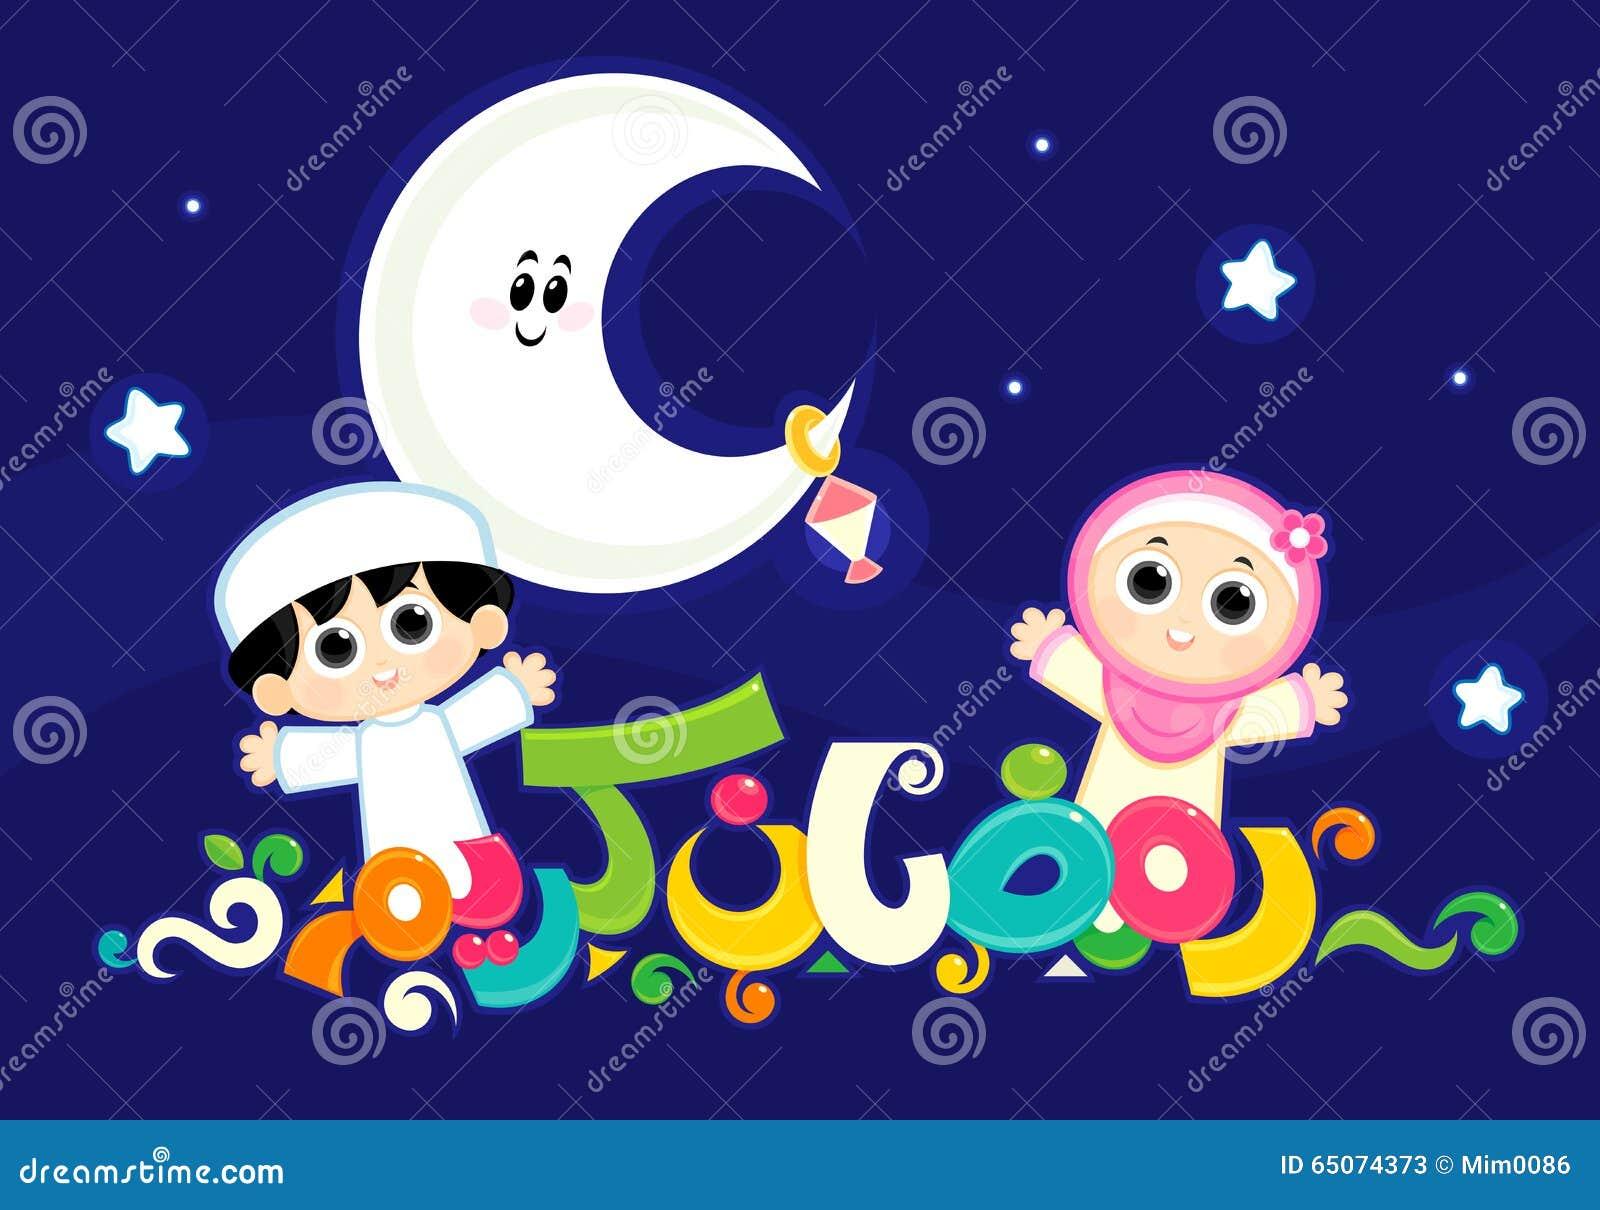 Translation Happy Ramadan Is The Ninth Month Of Muslim Calendar Text Written In Arabic